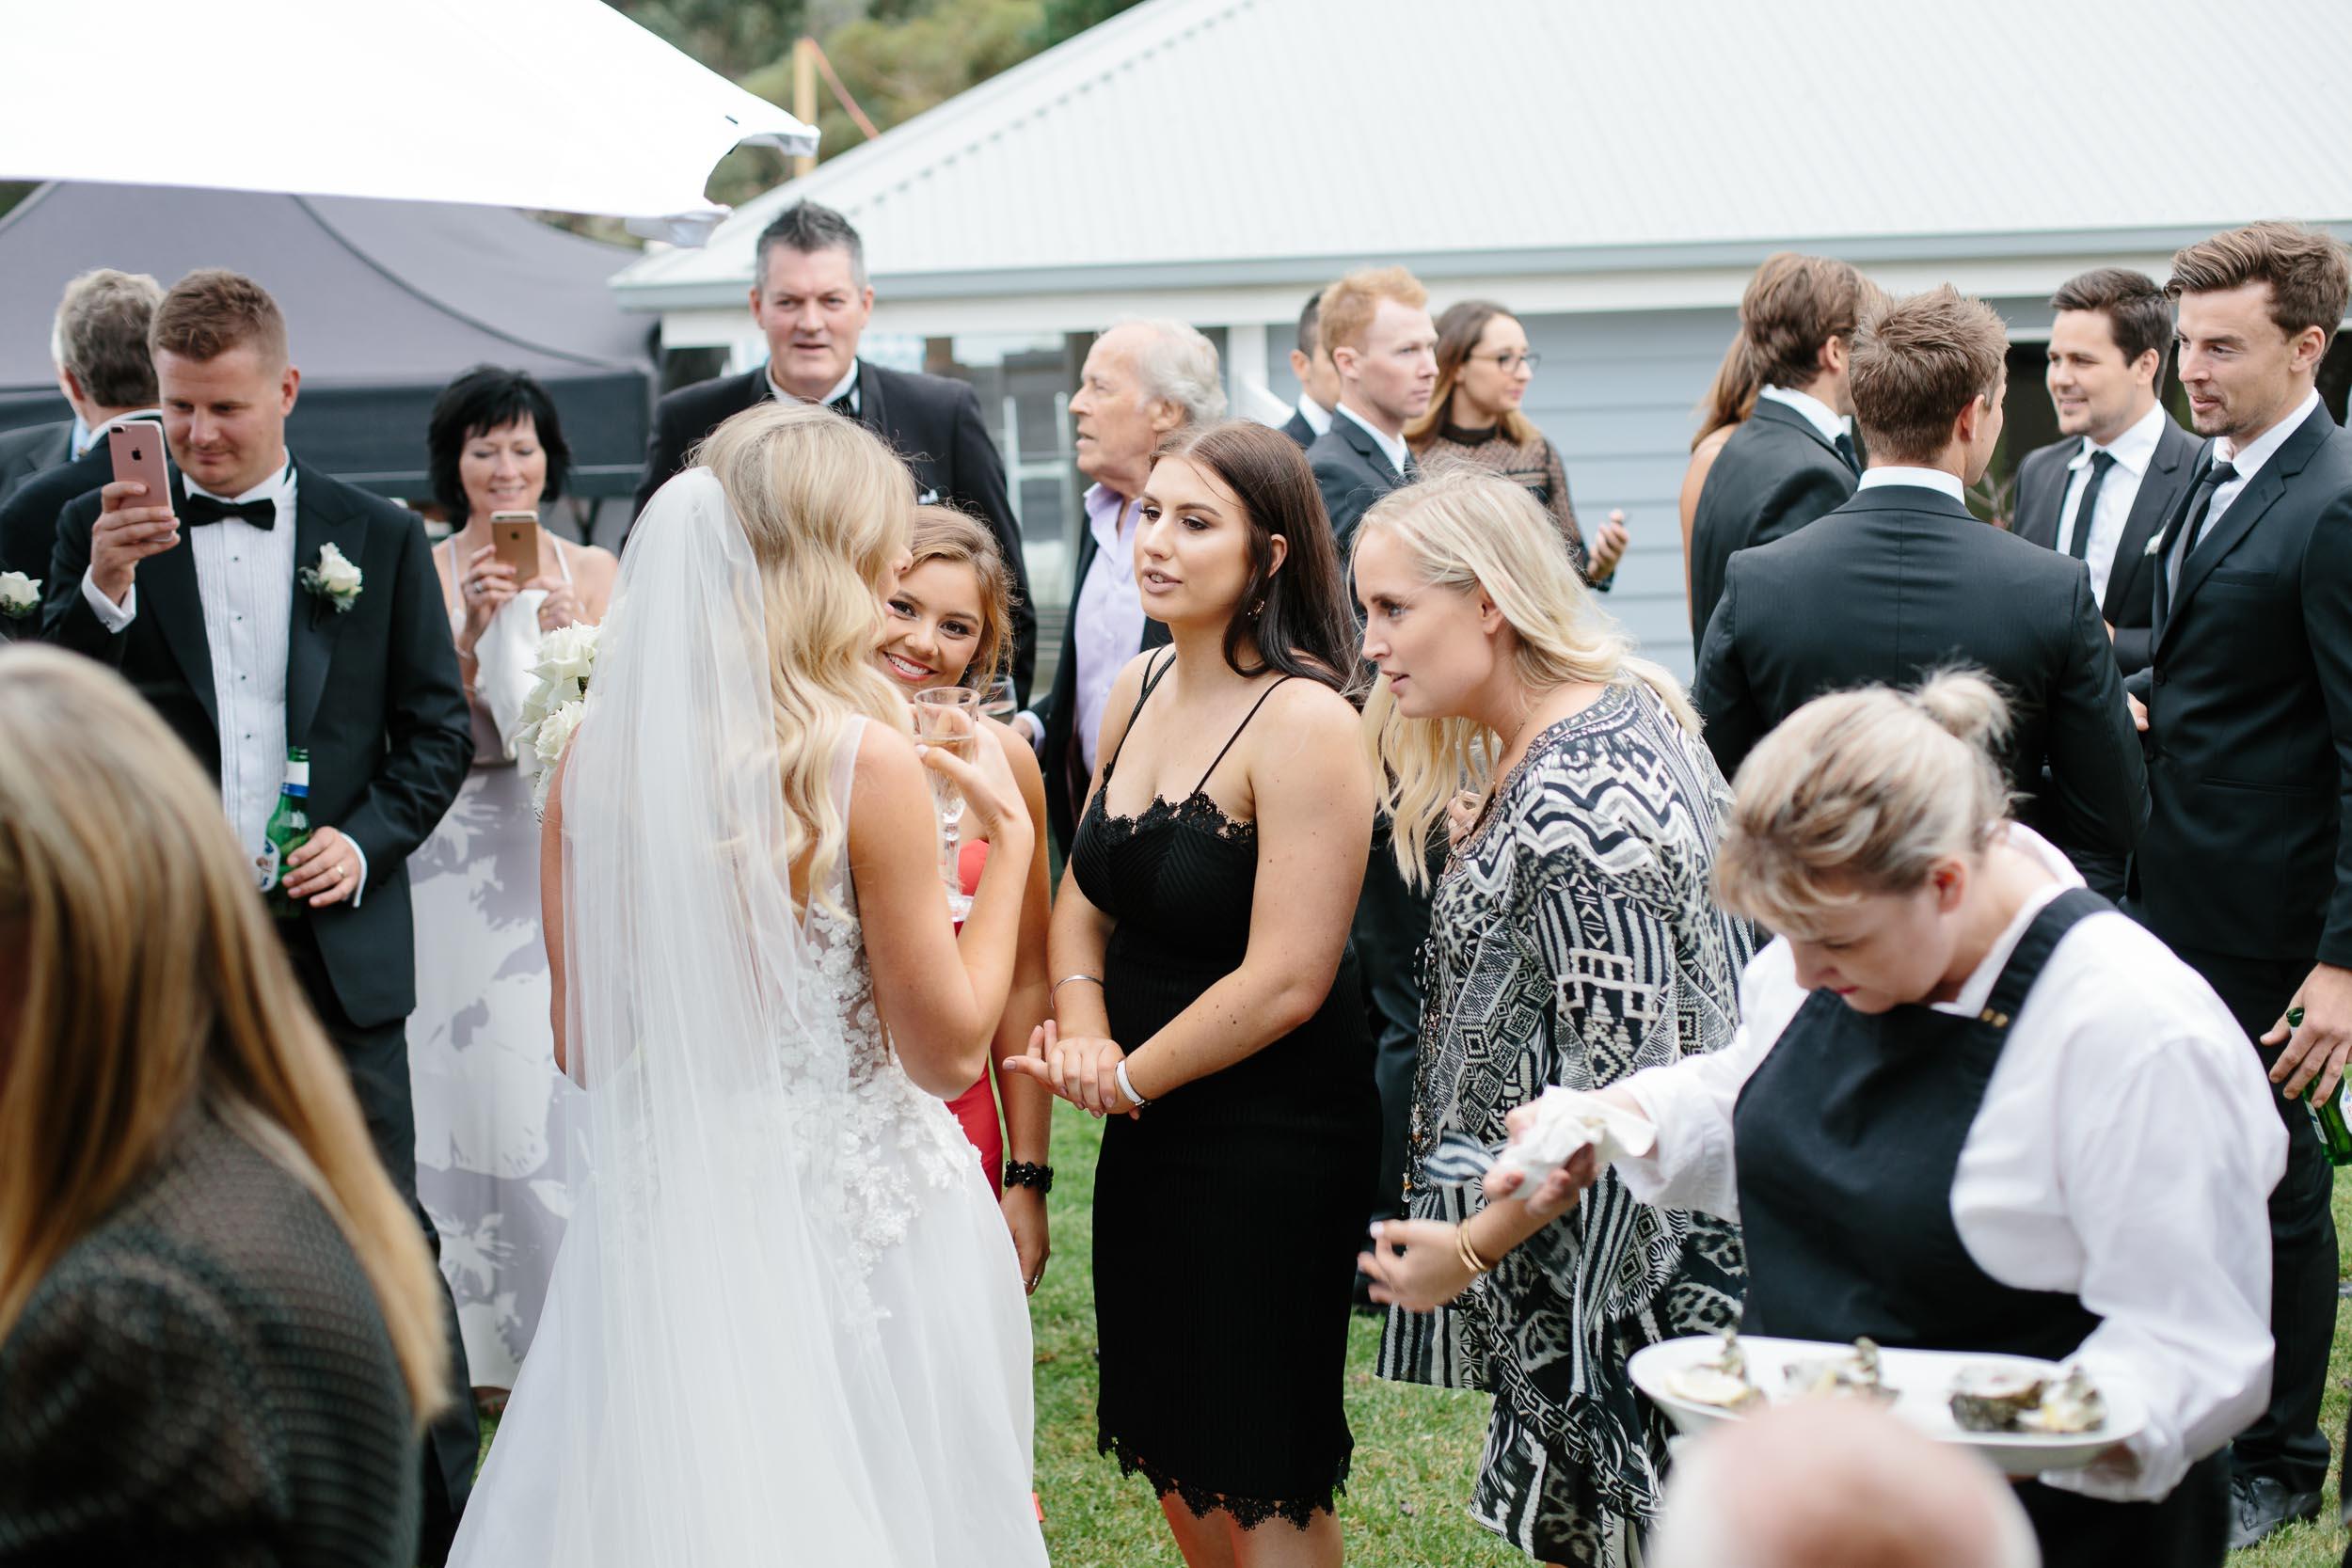 Kas-Richards-Mornington-Peninsula-Private-Property-Wedding-Marianna-Hardwick-Gown-577.jpg